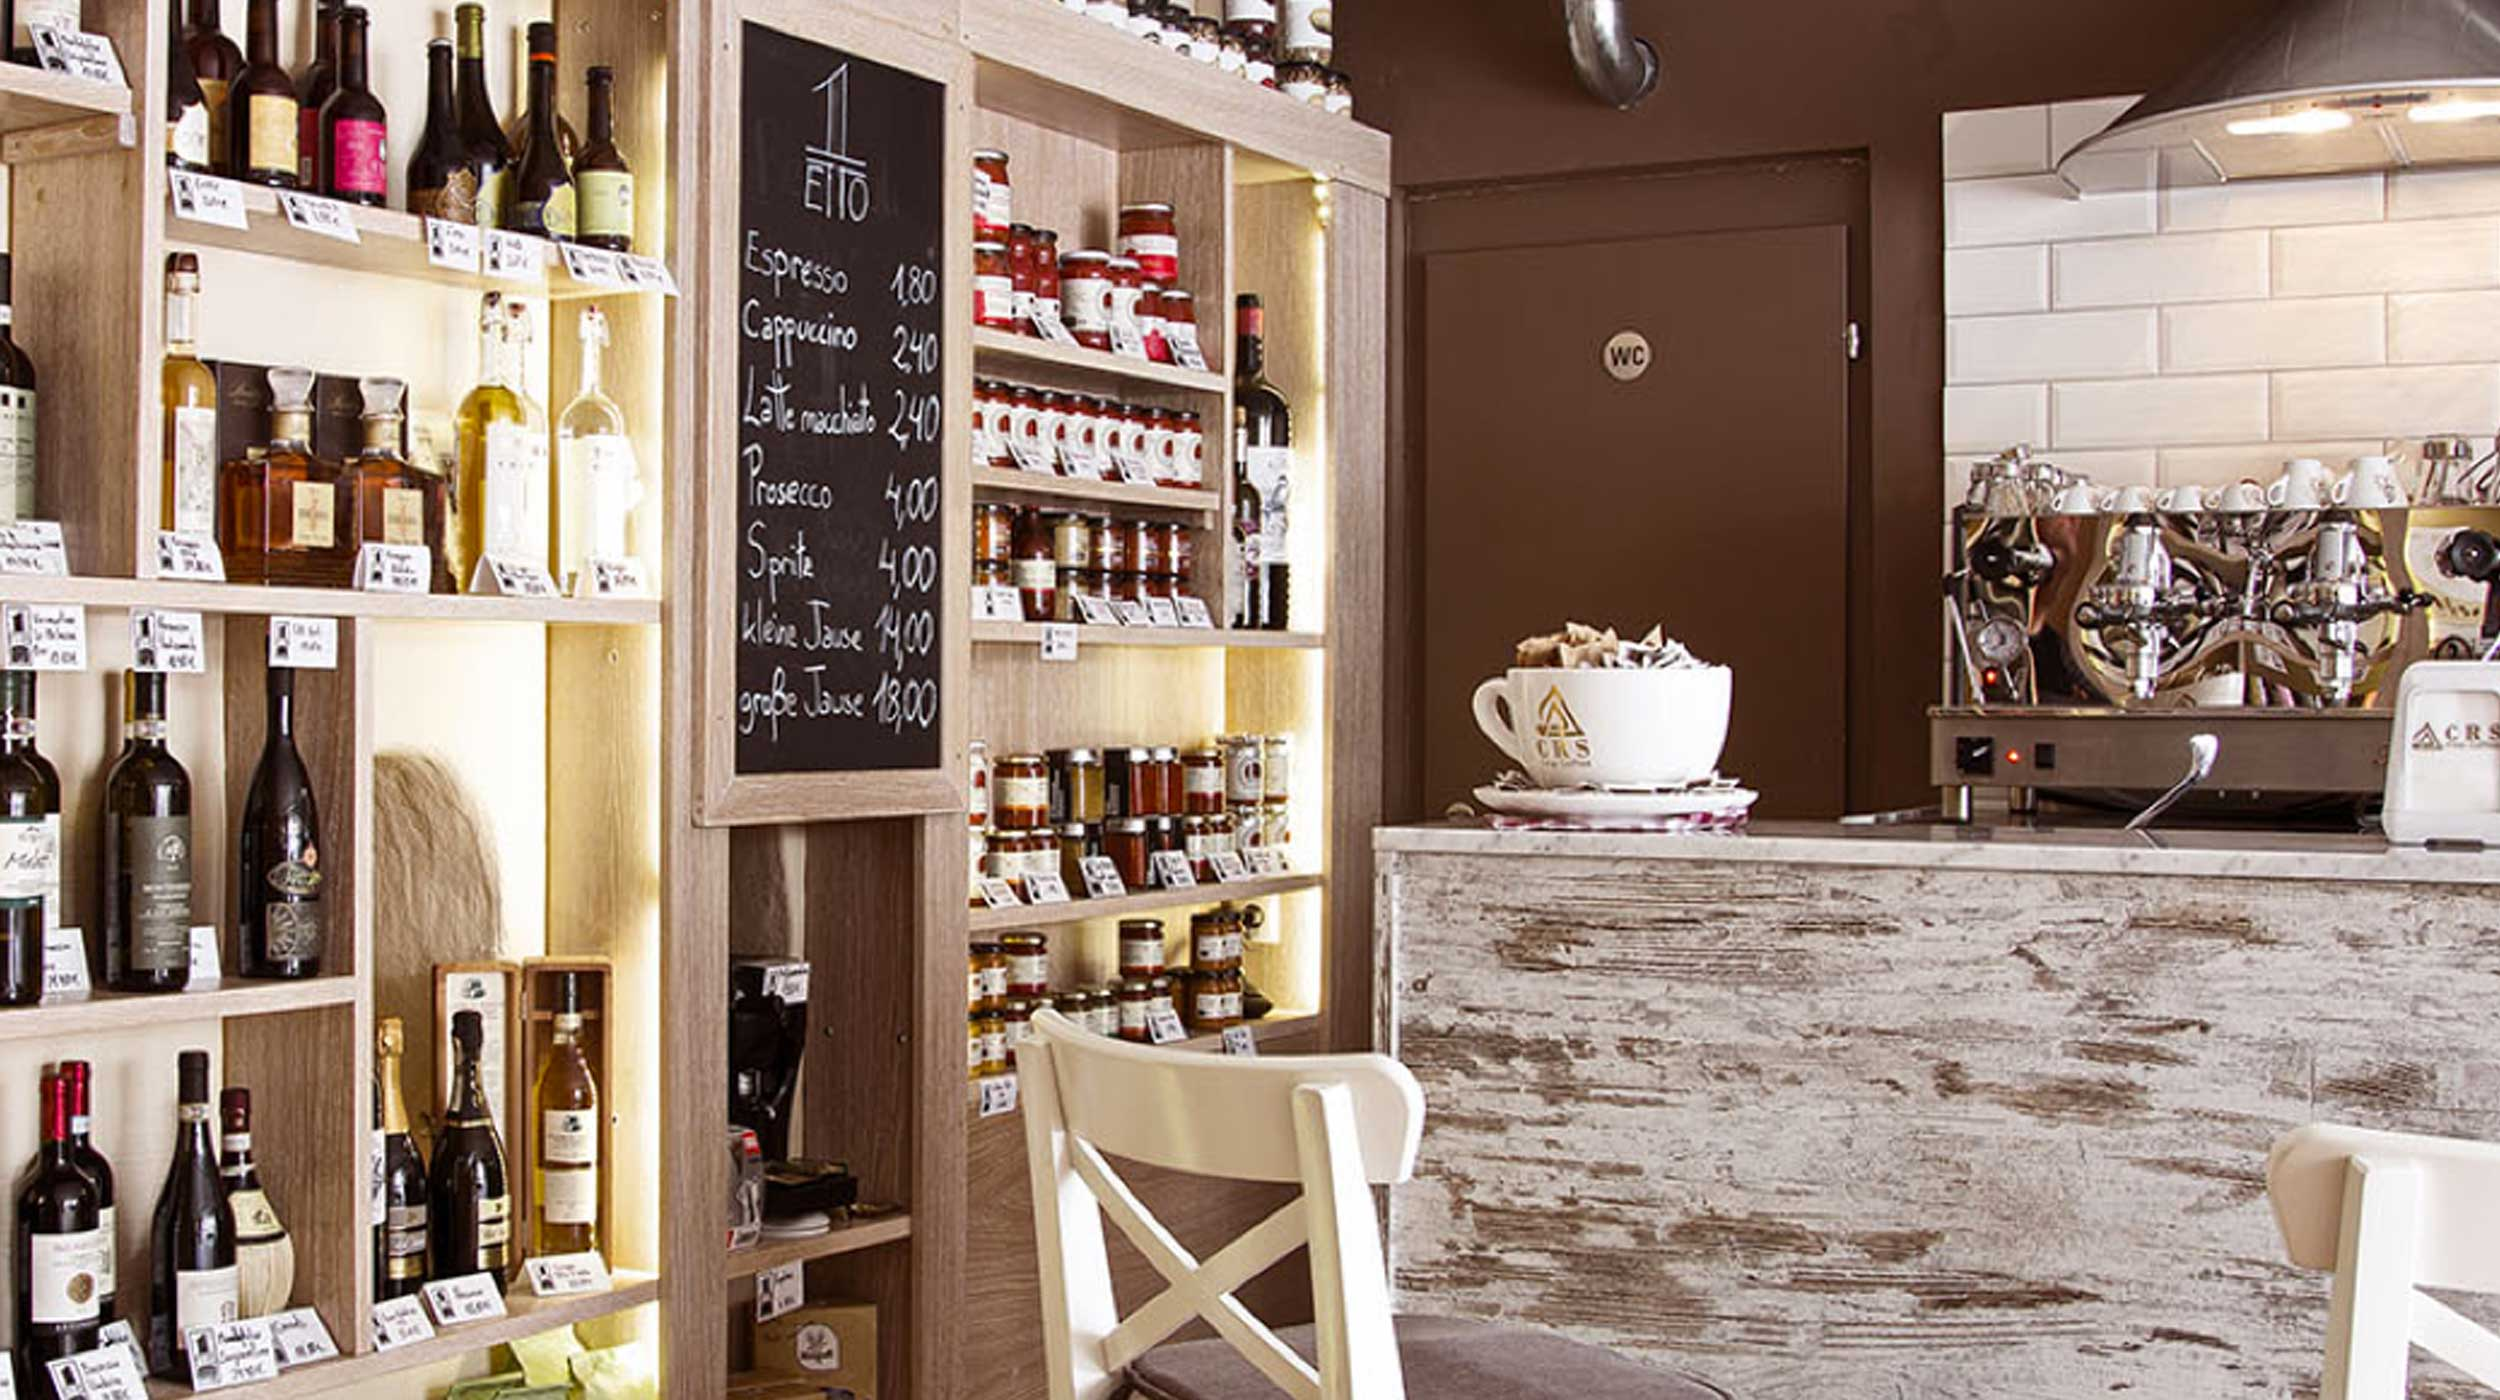 Etto | Arredo Bar, Pasticcerie e Gelaterie